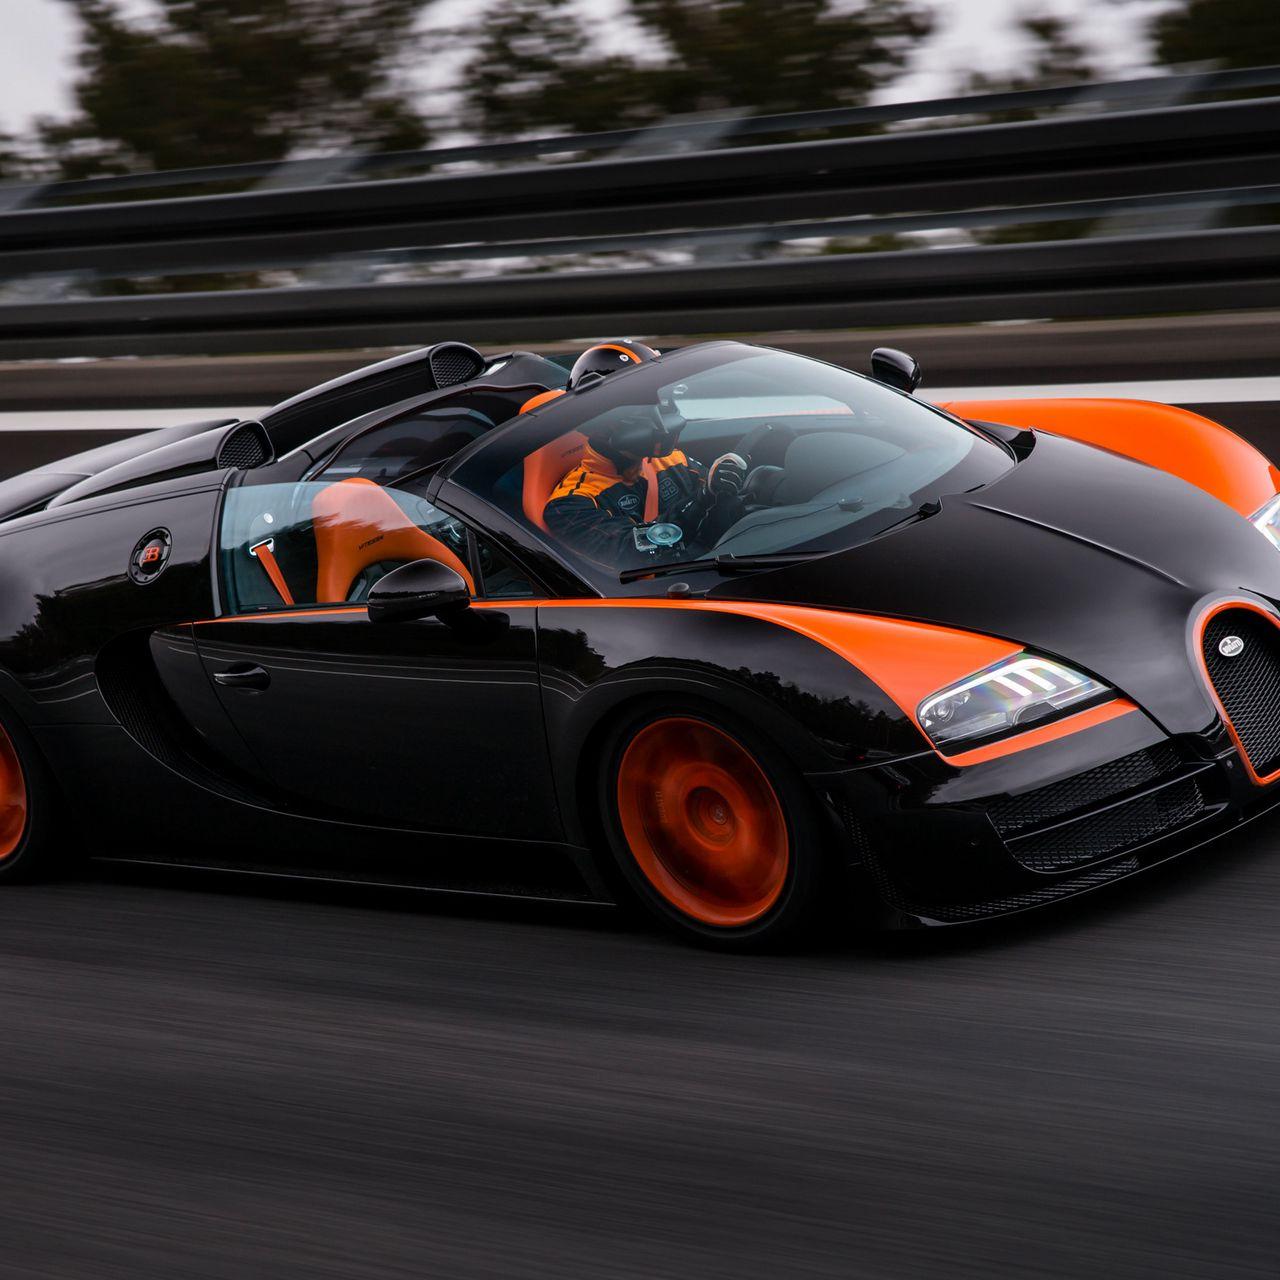 1280x1280 Wallpaper bugatti, grand sport, roadster, vitesse, wrc edition, veyron